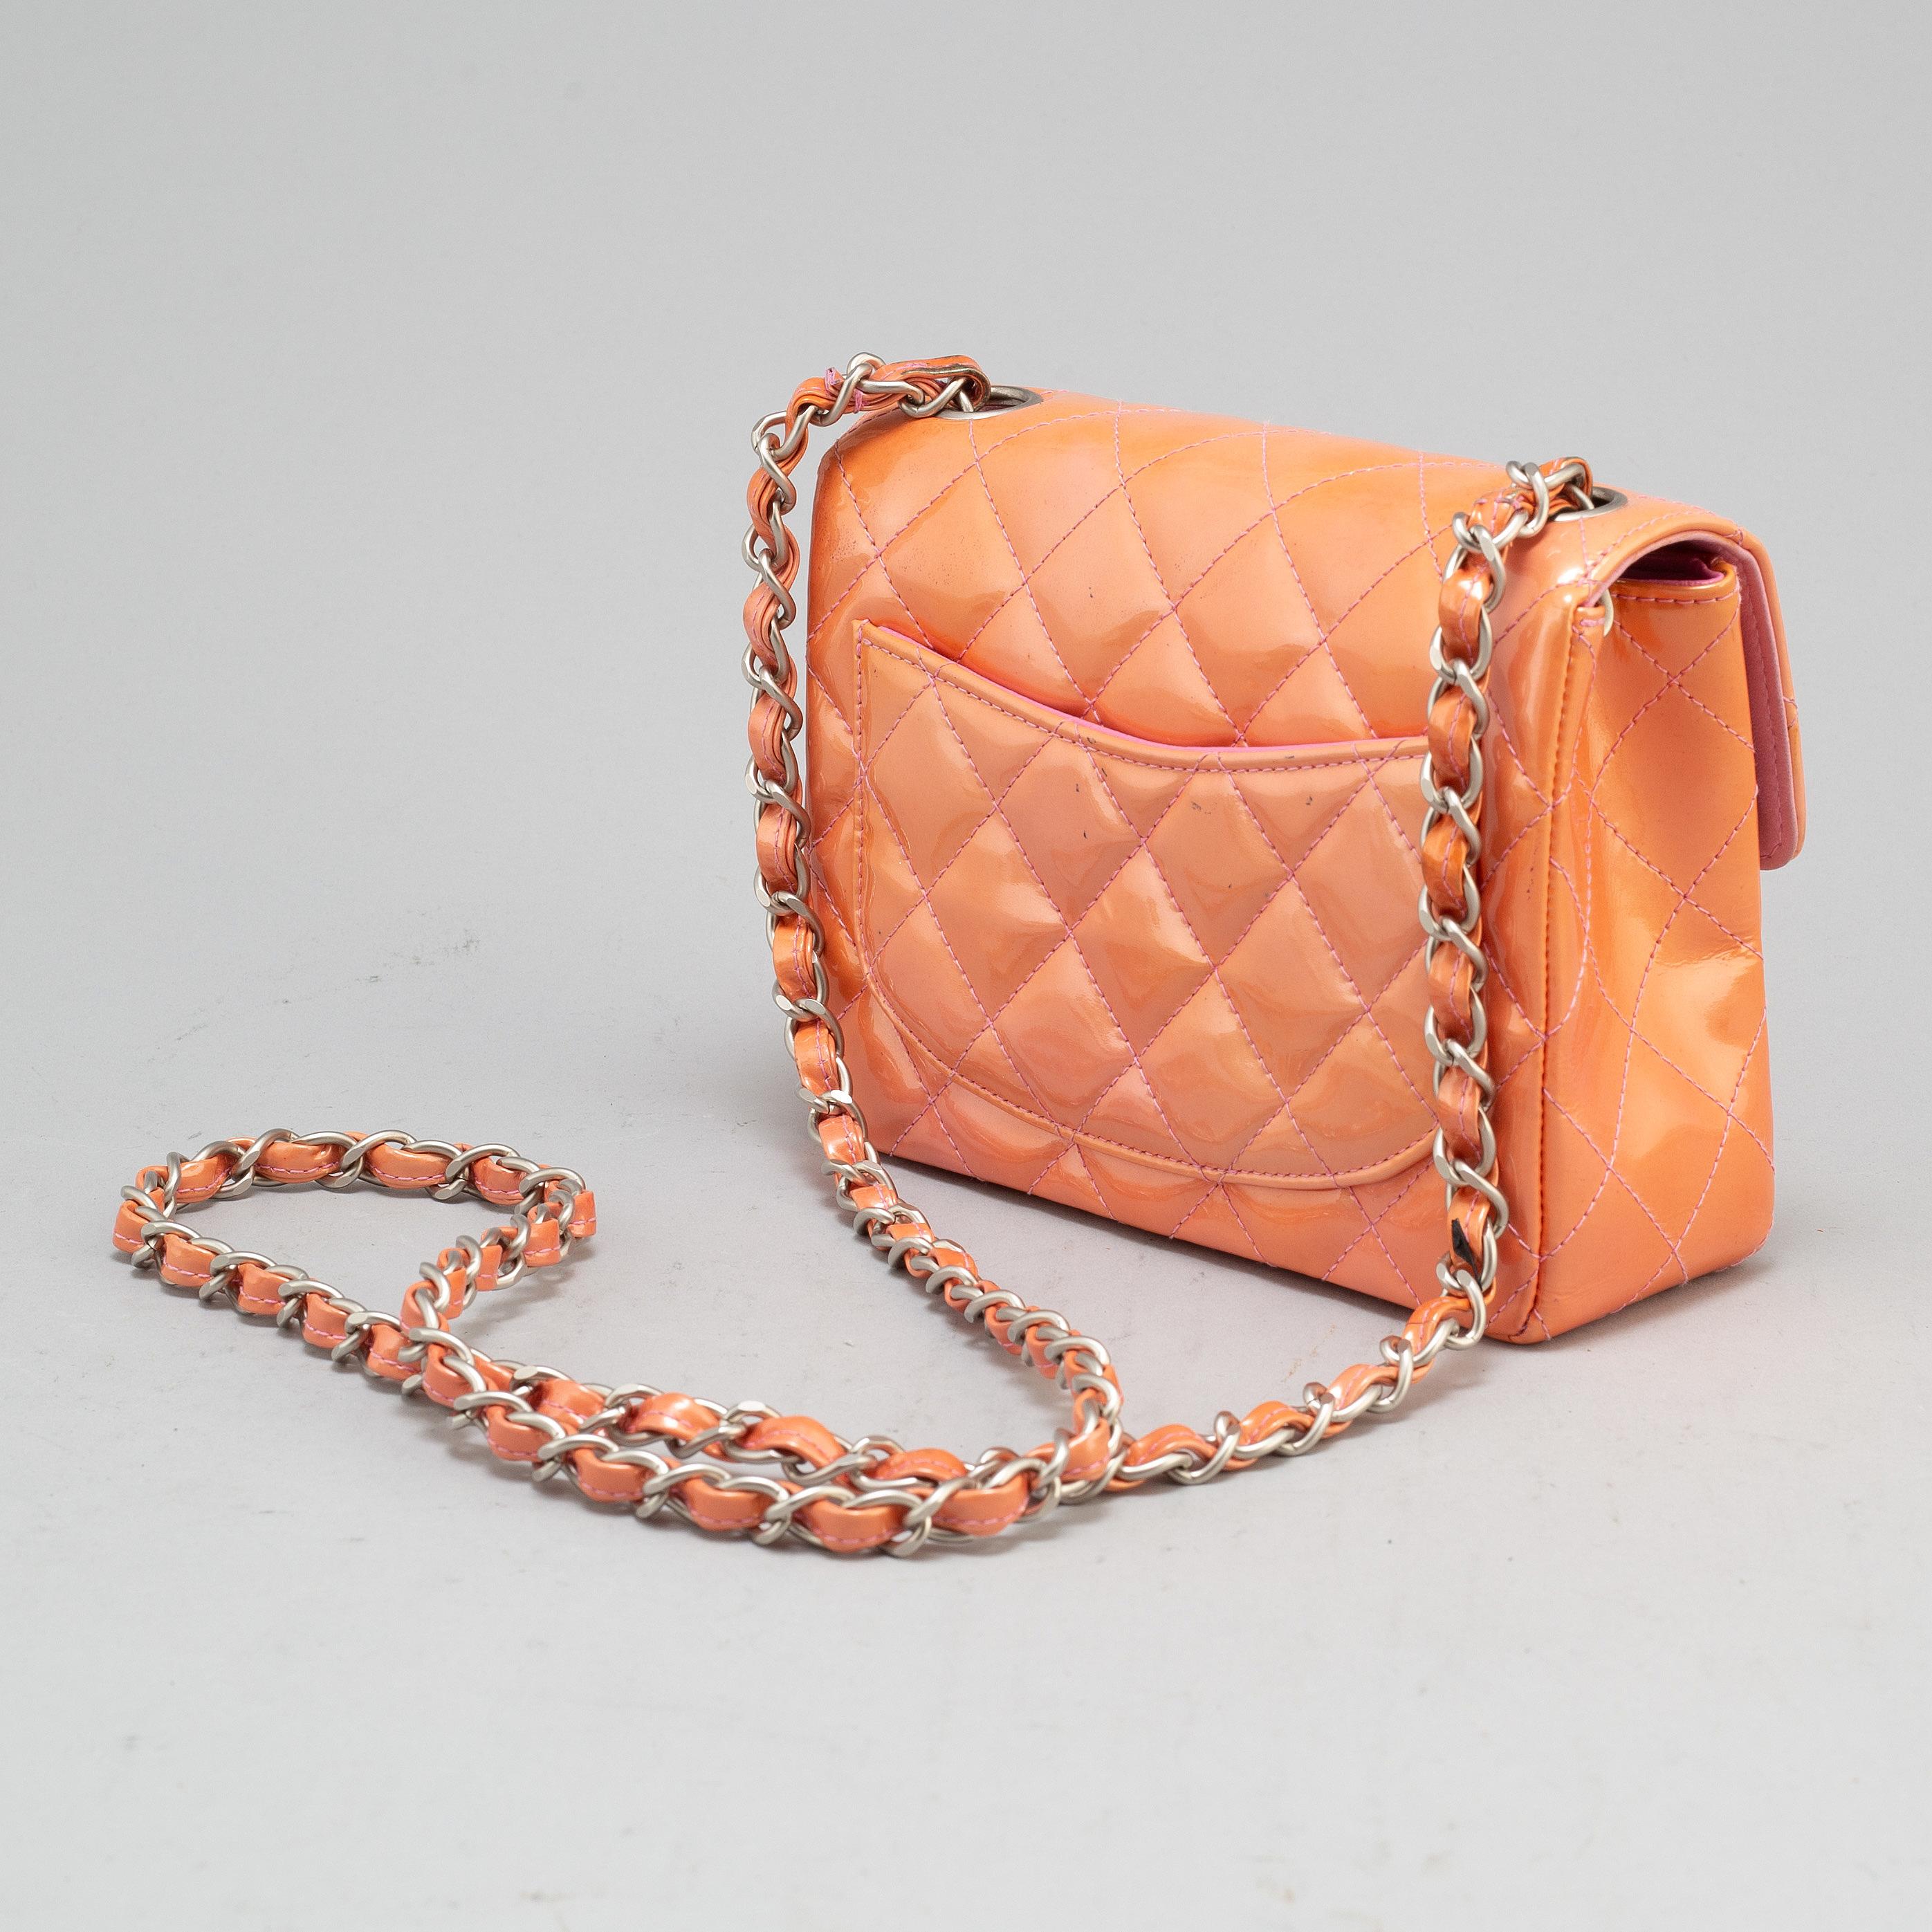 1c0b48b35 CHANEL, a mini Flap Bag, 2000-2002. - Bukowskis